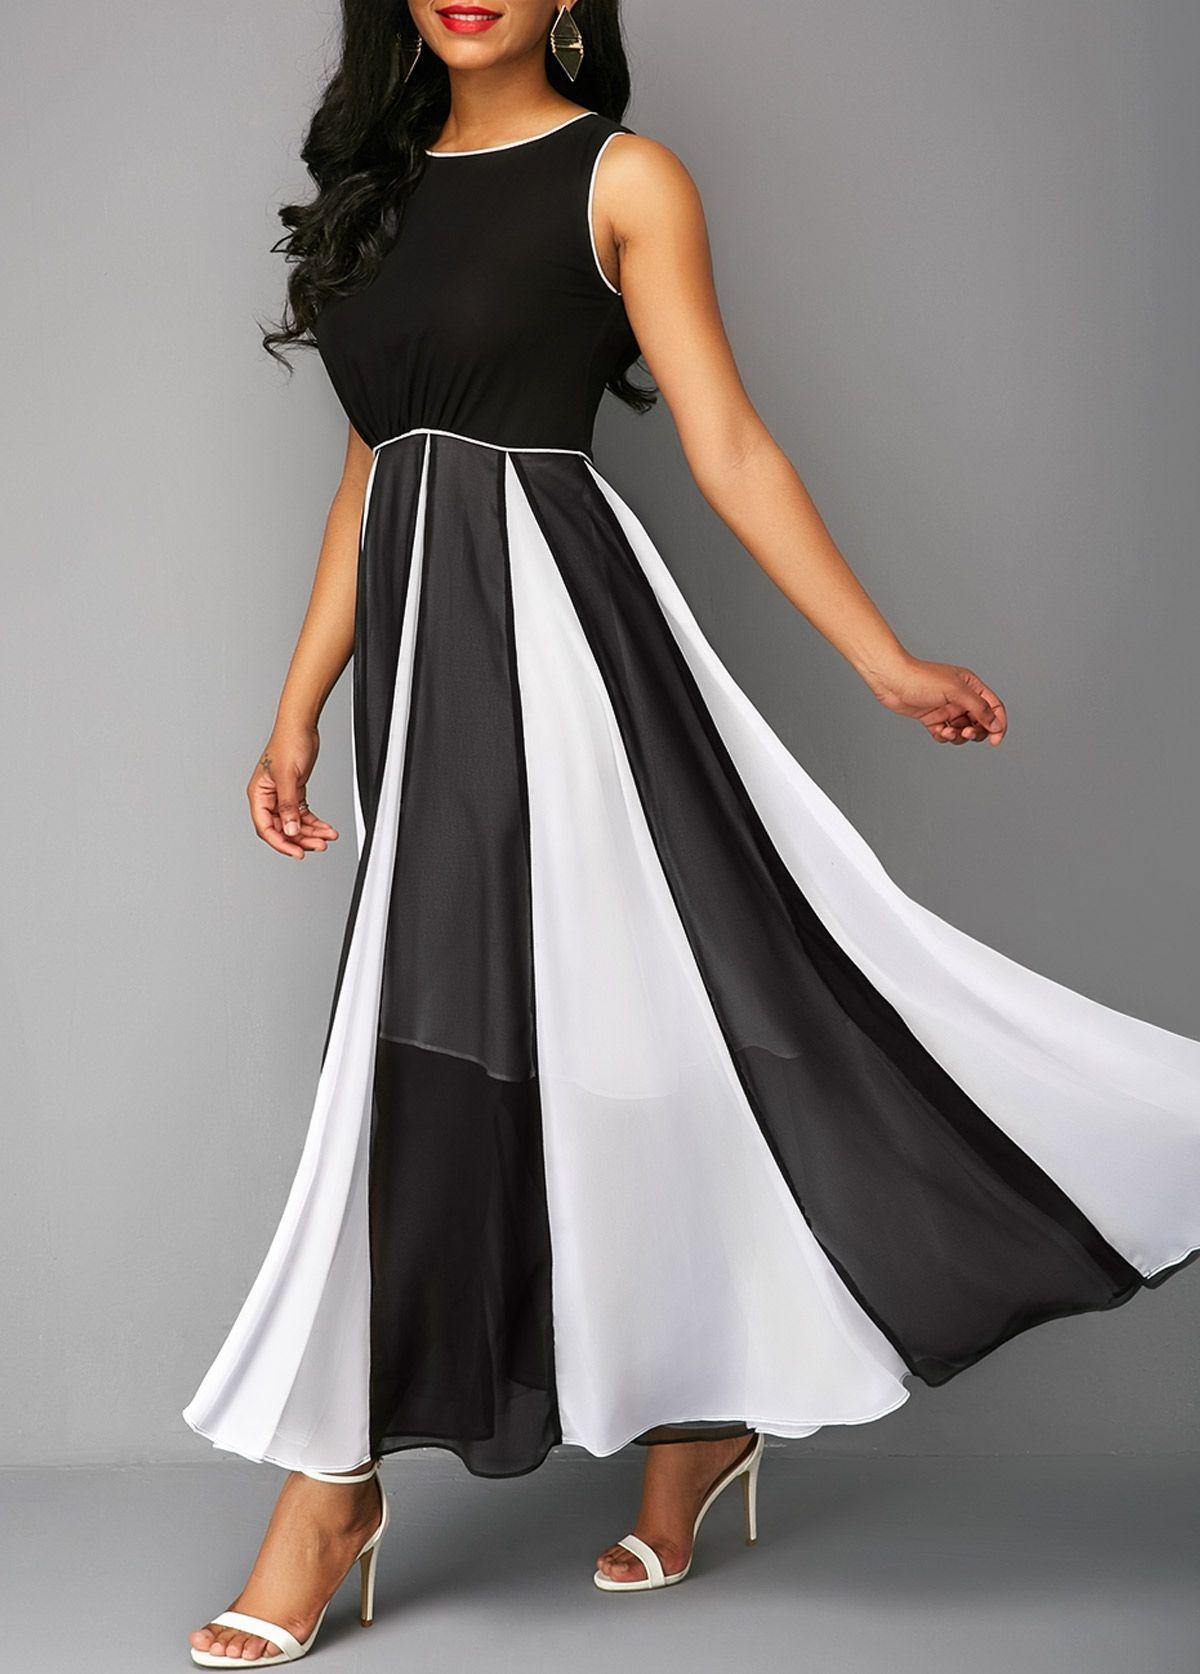 fd9f72b295c24 Black Sleeveless Round Neck Maxi Dress | liligal.com - USD $34.42 ...